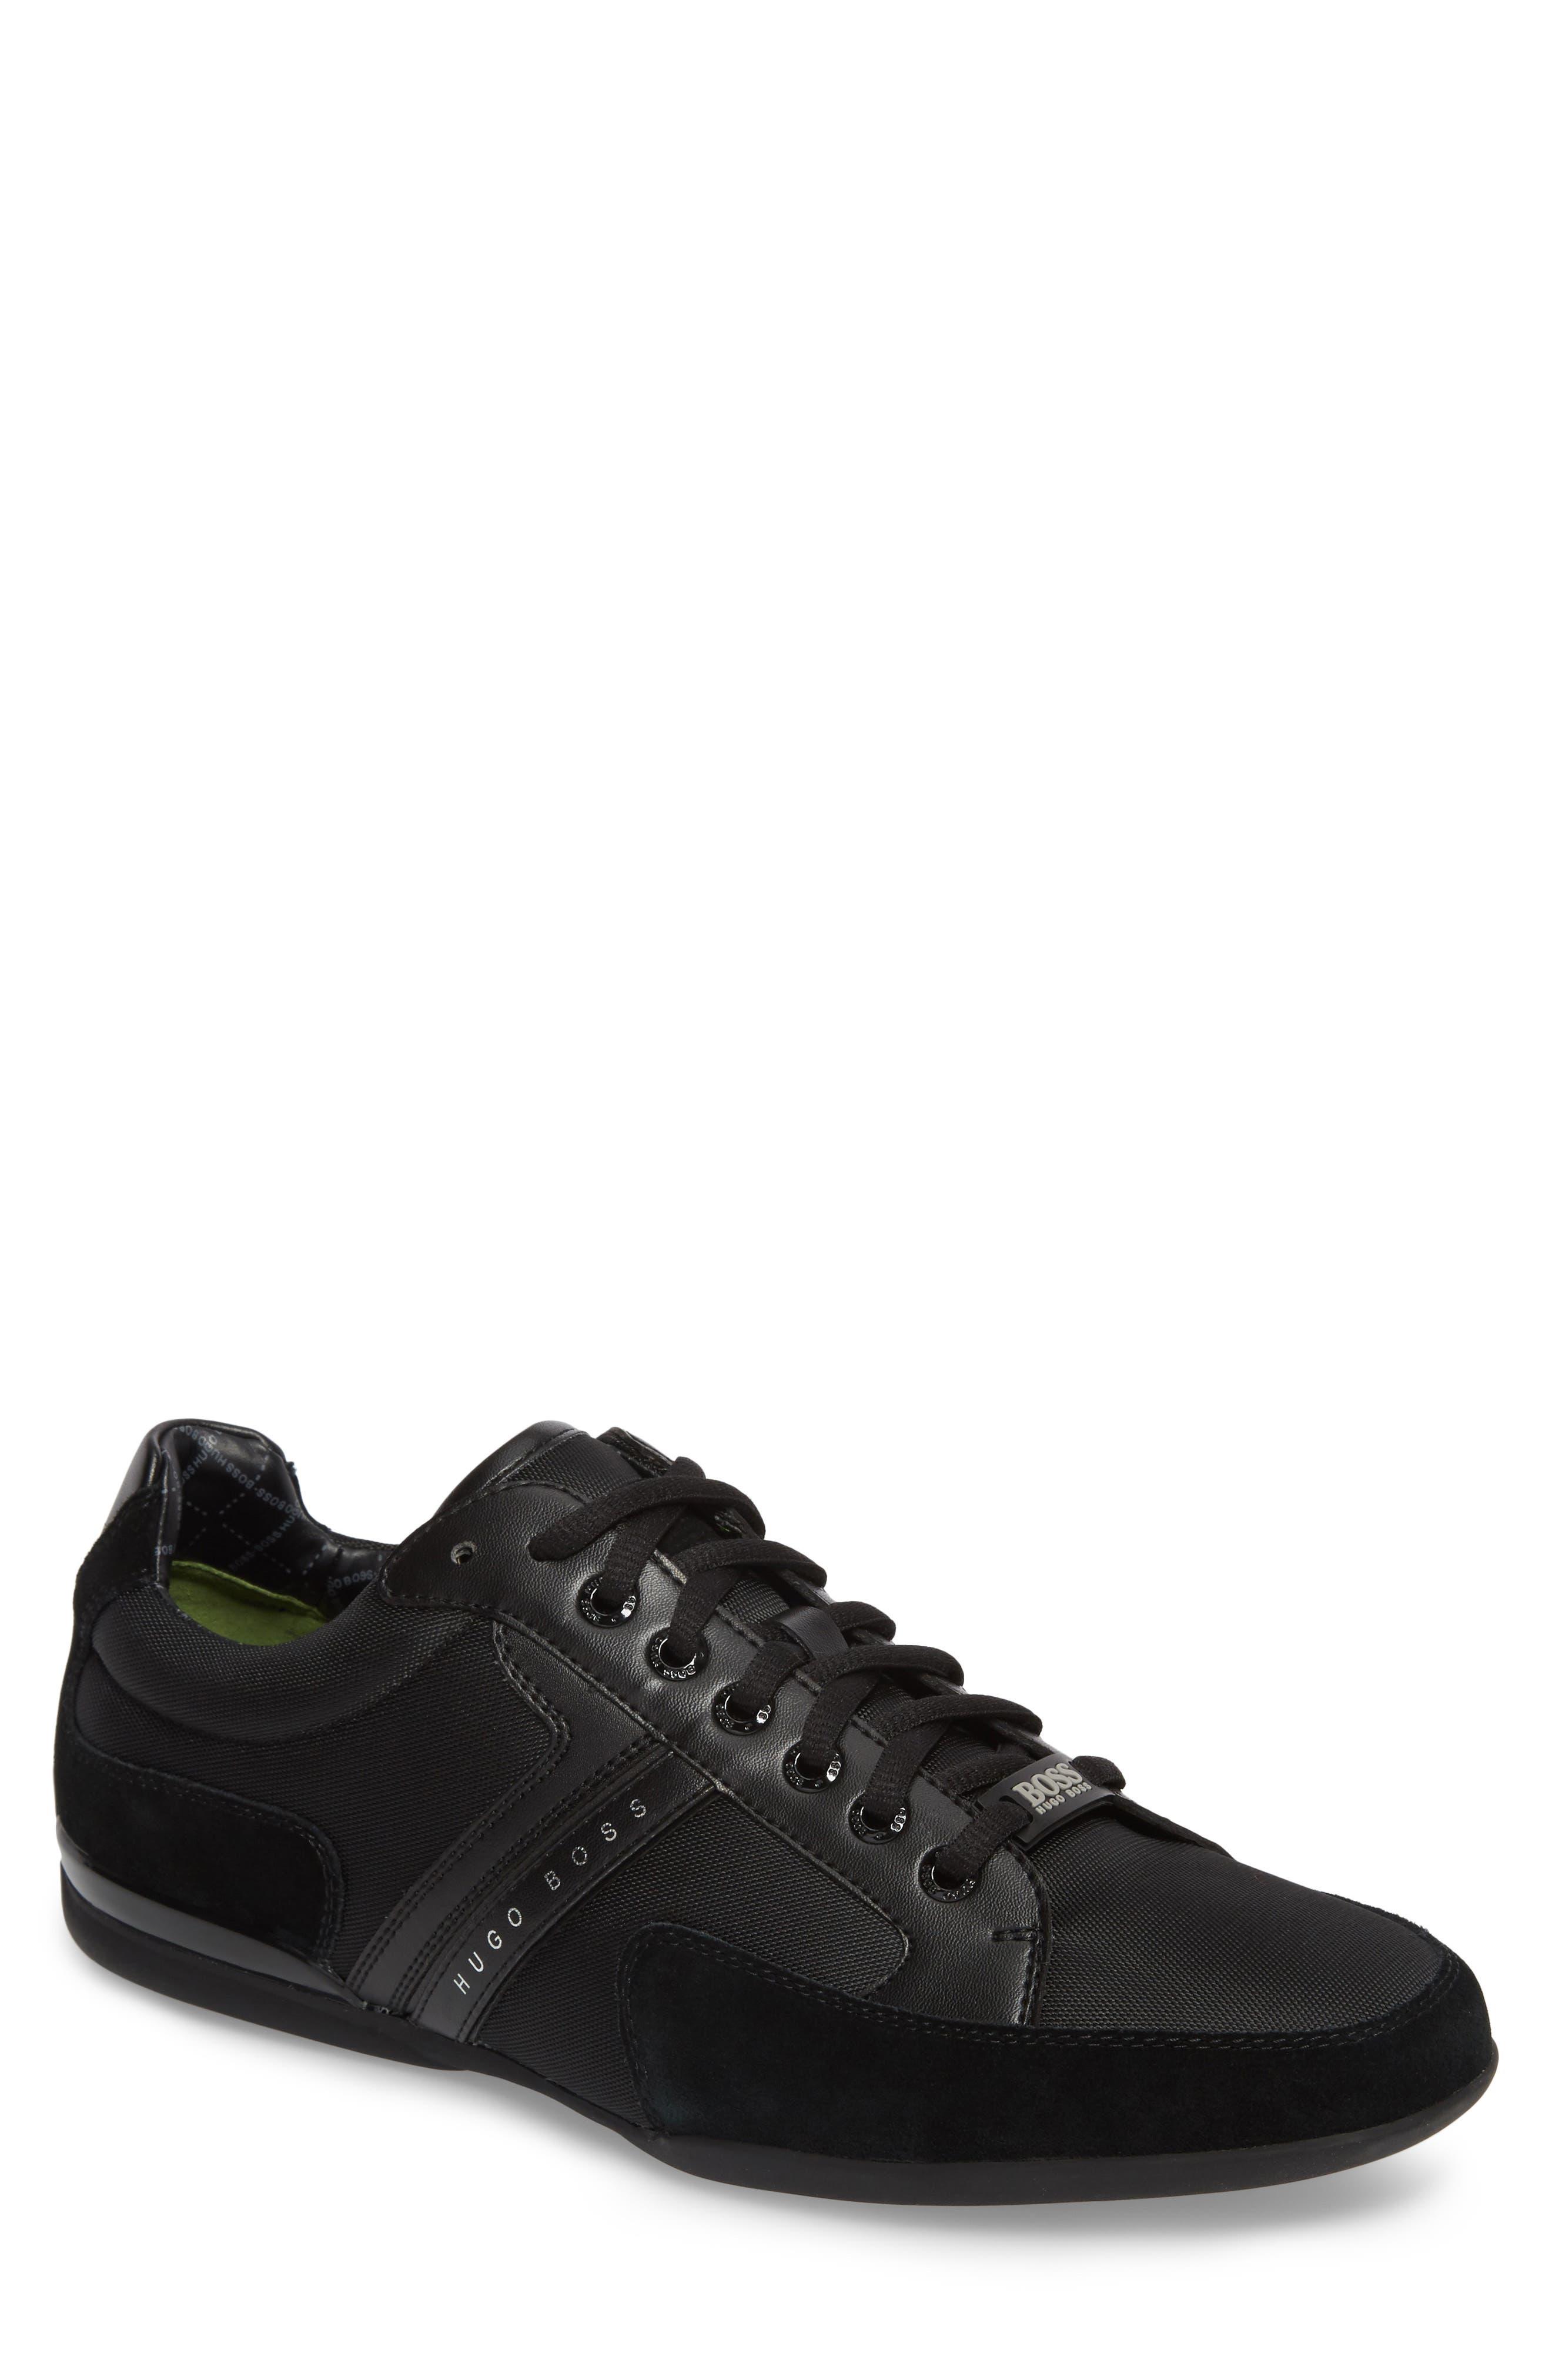 BOSS Hugo Boss Sneaker, Main, color, 001